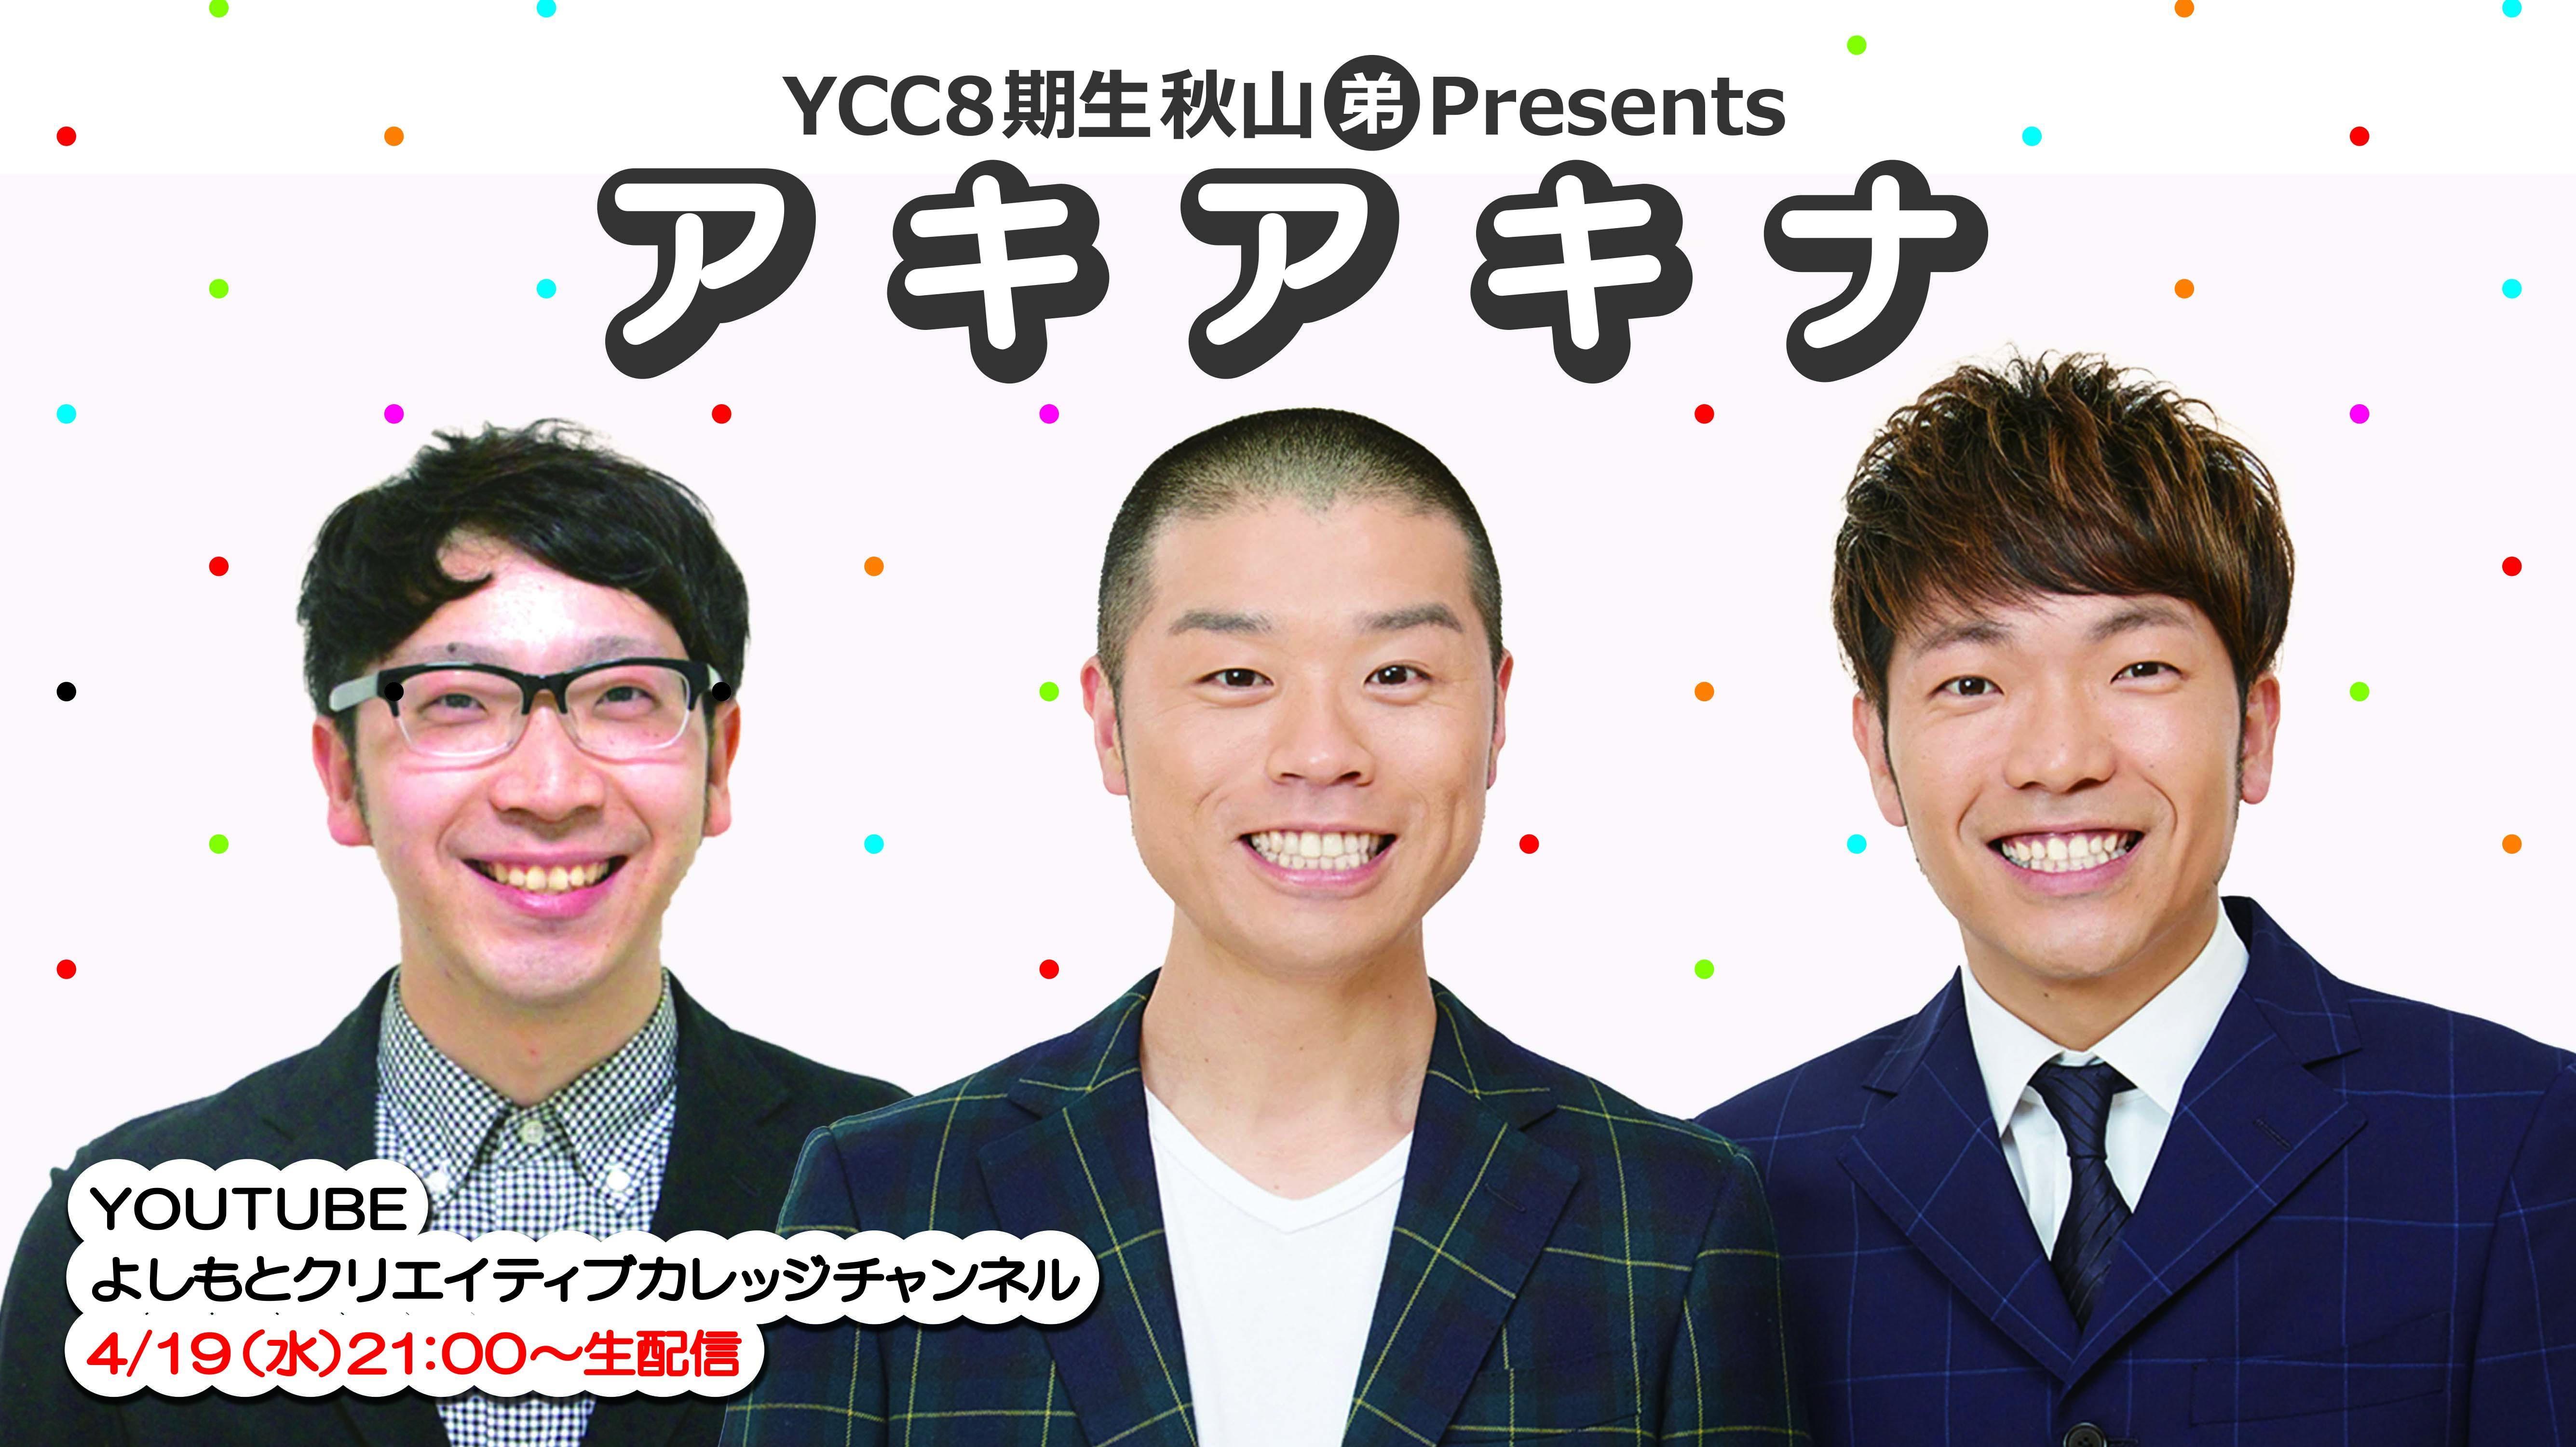 http://news.yoshimoto.co.jp/20170412134310-1fc3c212428821a1269211a48f54fd59a9c008b9.jpg